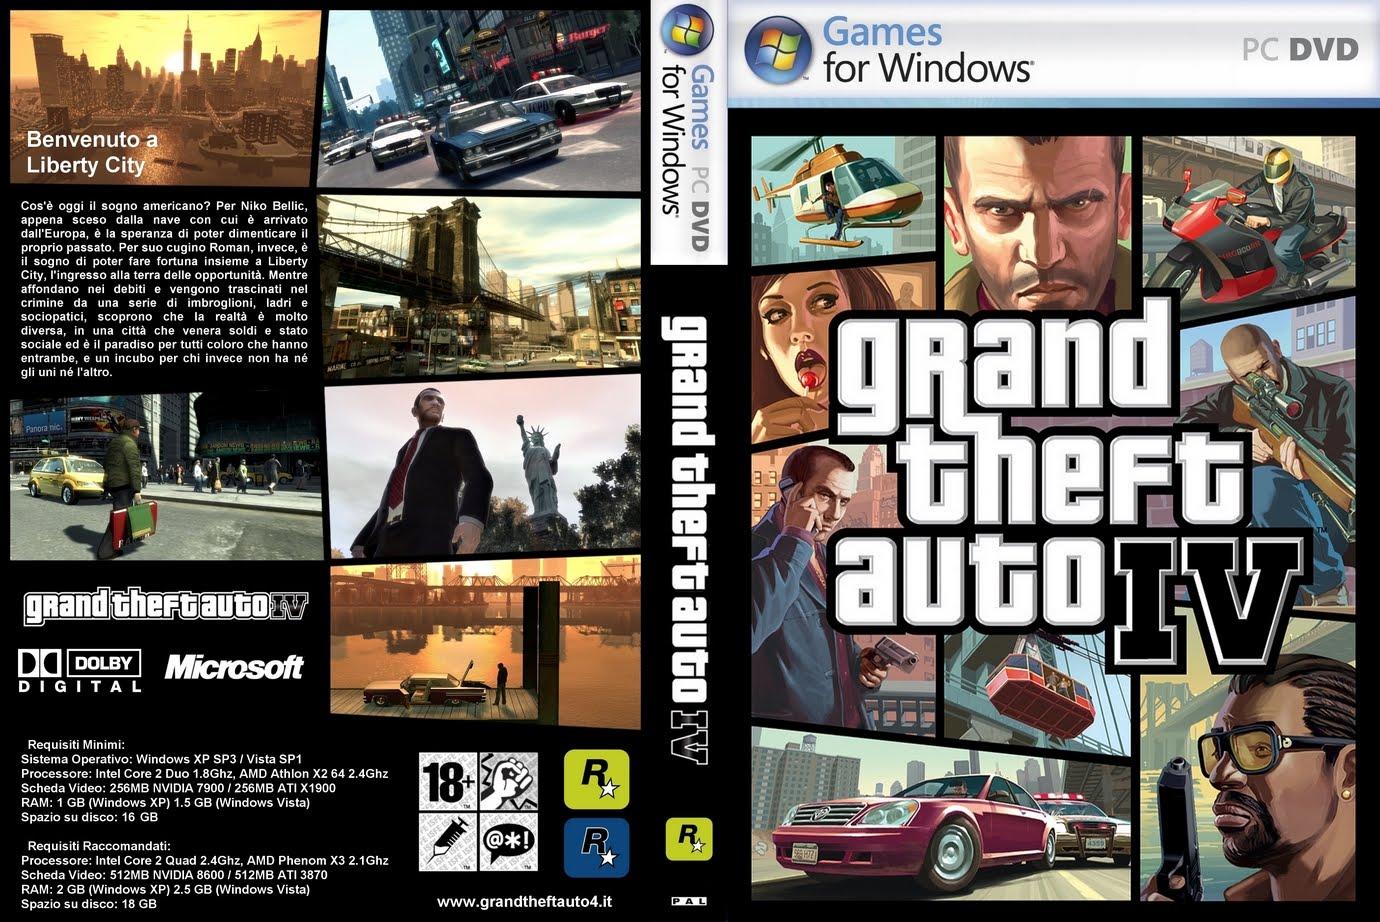 http://4.bp.blogspot.com/-YnwvfjD3ook/TjmThOtQerI/AAAAAAAAANg/y-MbJ-bZbgI/s1600/1_GTA_IV_4_gtaiv_gta4_grand_theft_auto_cover_full__pc_by_SieL.jpg